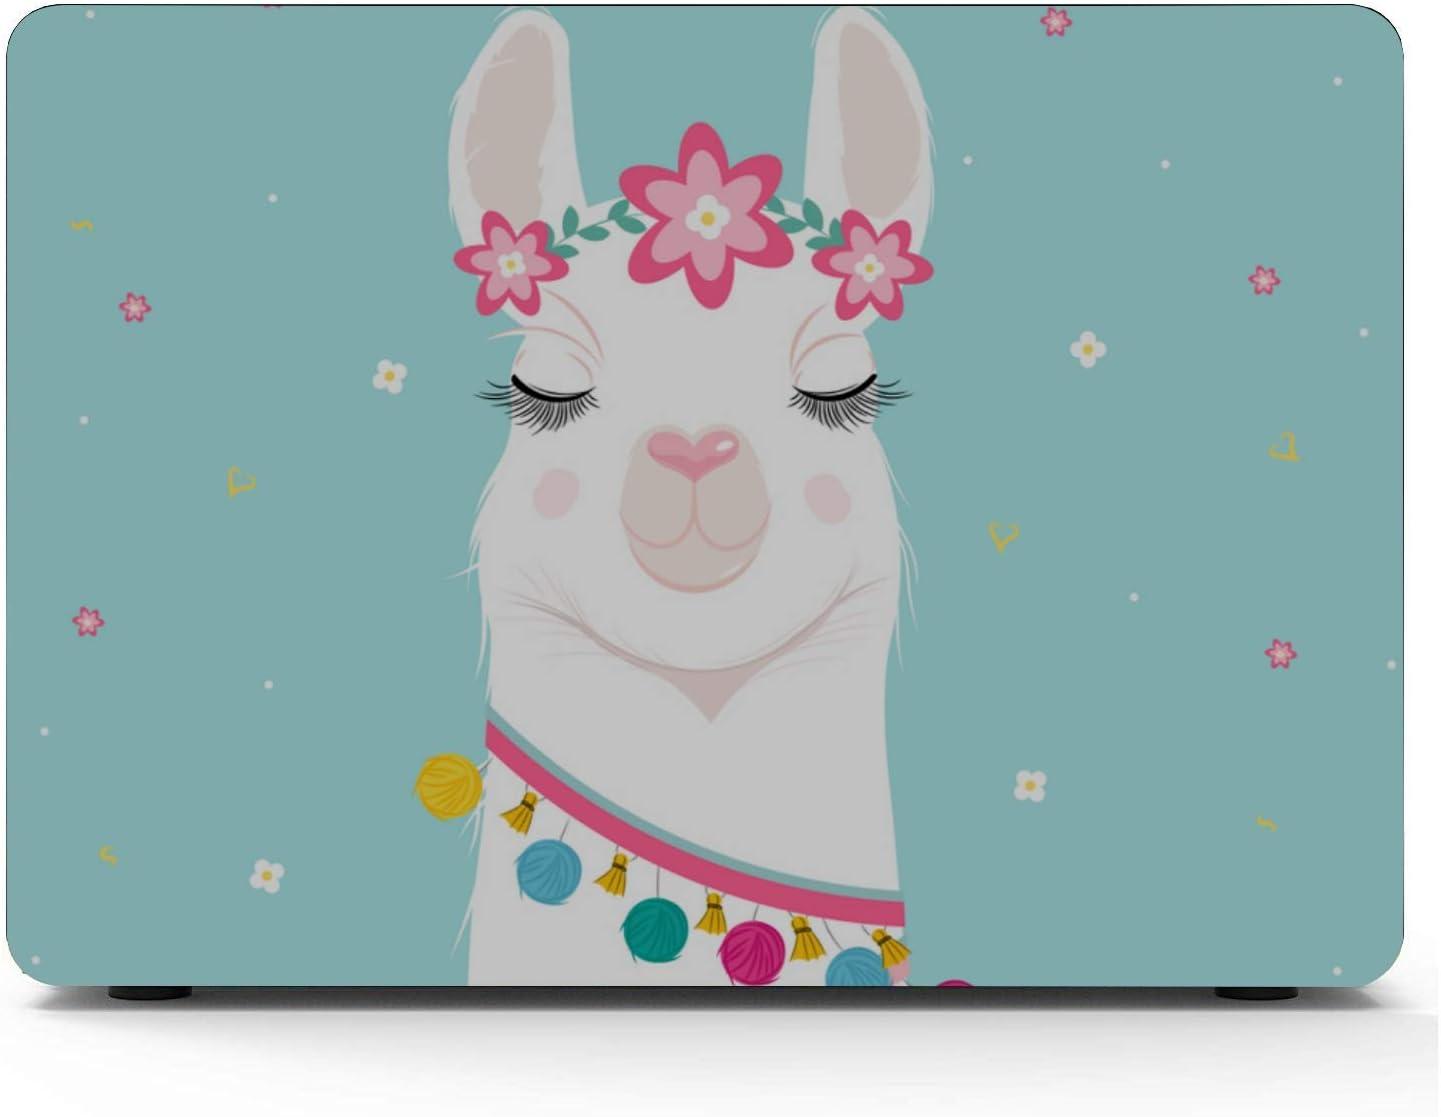 Mac Pro Laptop Case Cartoon Humorous Alpaca Llama Plastic Hard Shell Compatible Mac Air 11 Pro 13 15 MacBook Air Accessories Protection for MacBook 2016-2019 Version